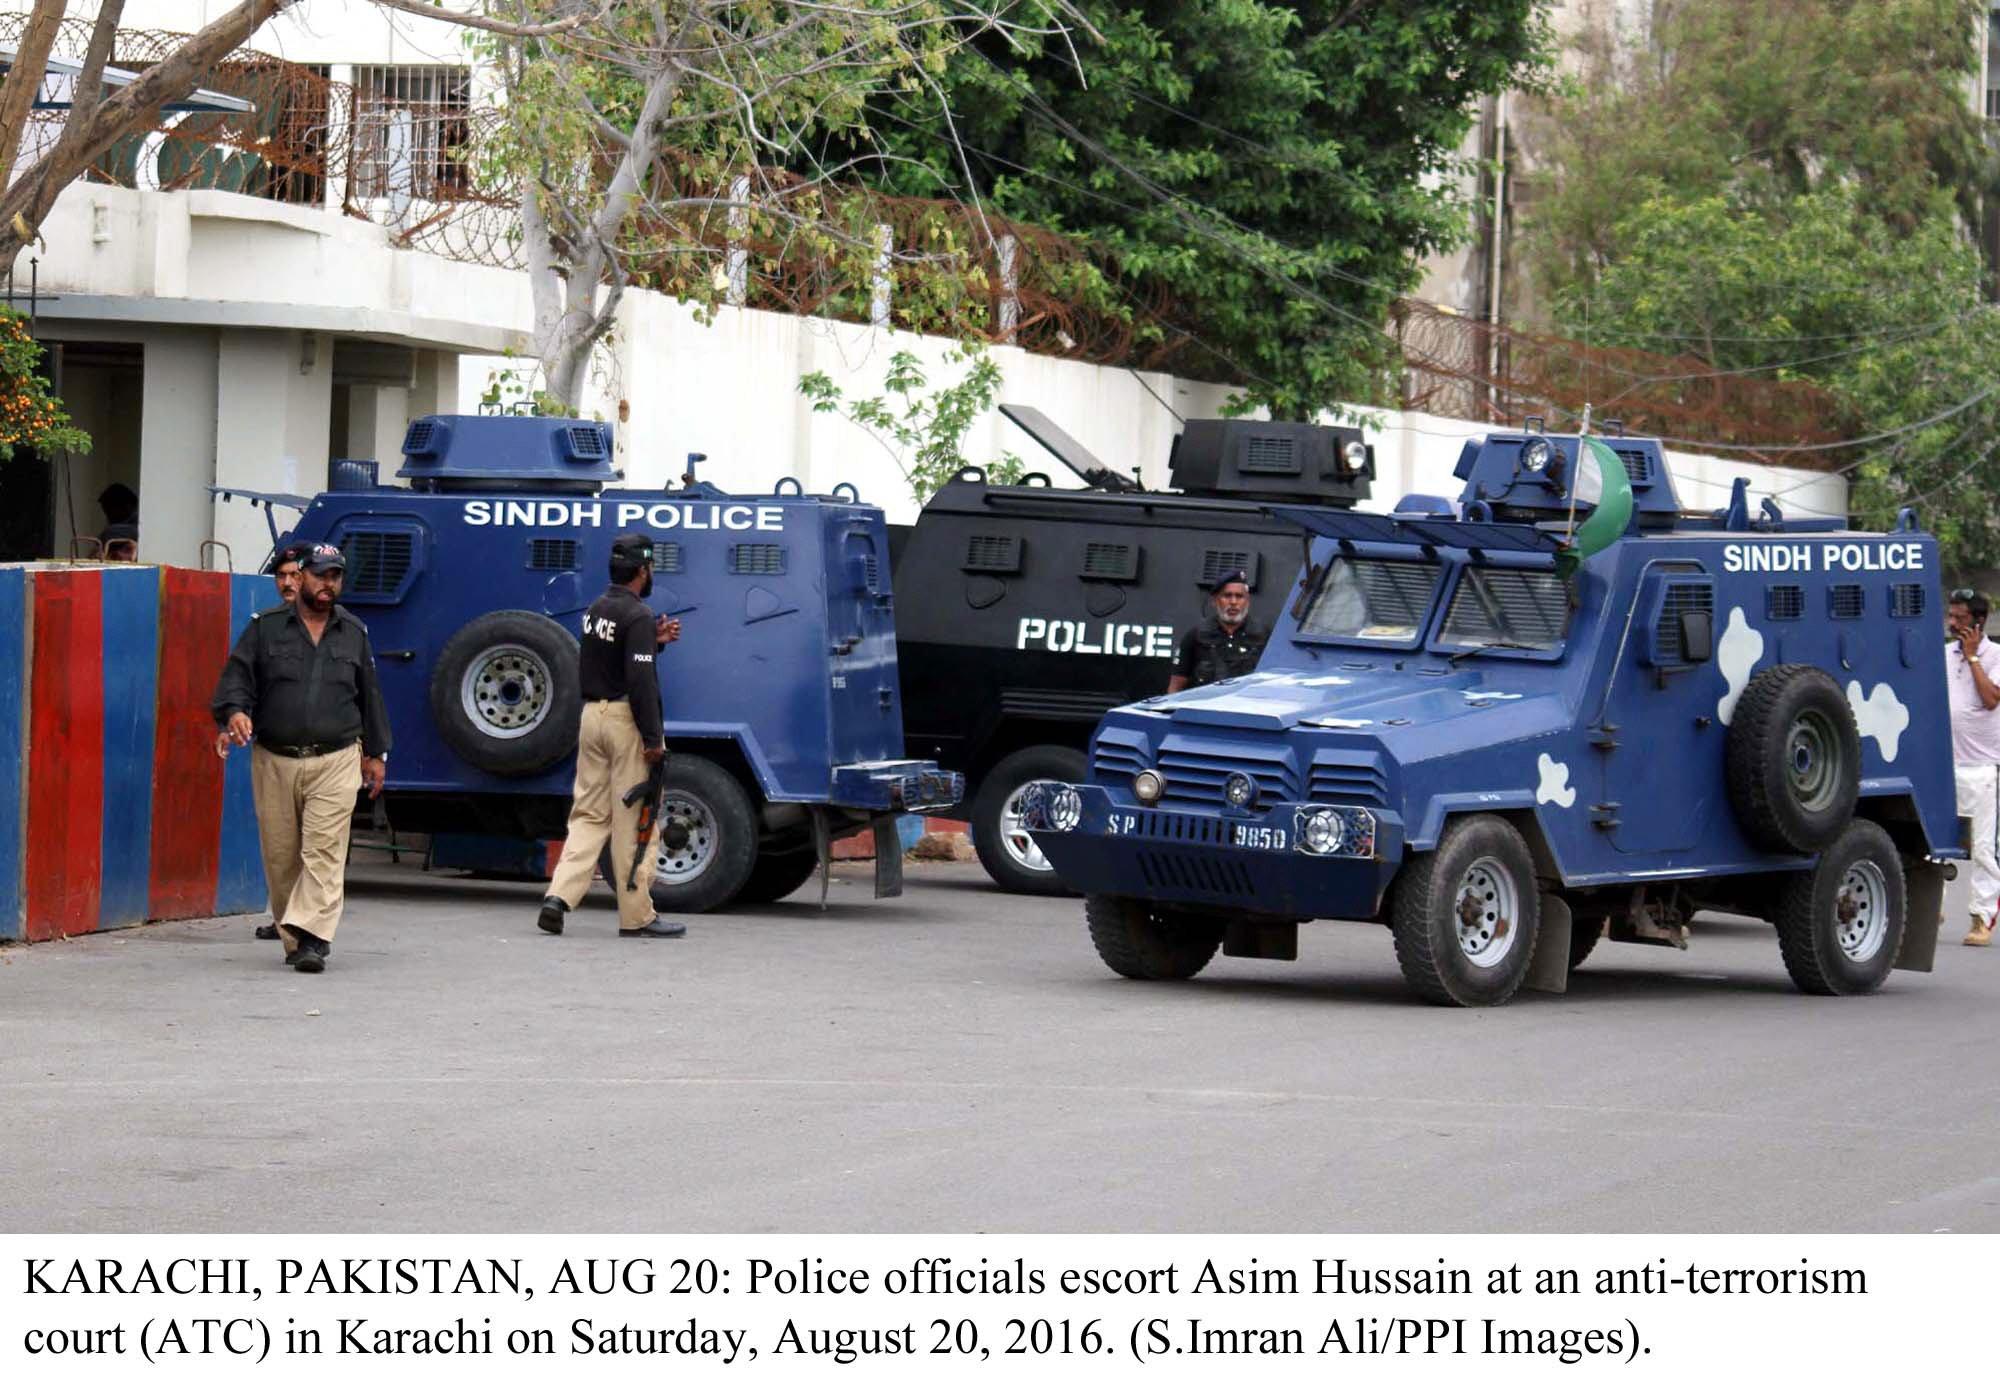 karachi police photo ppi